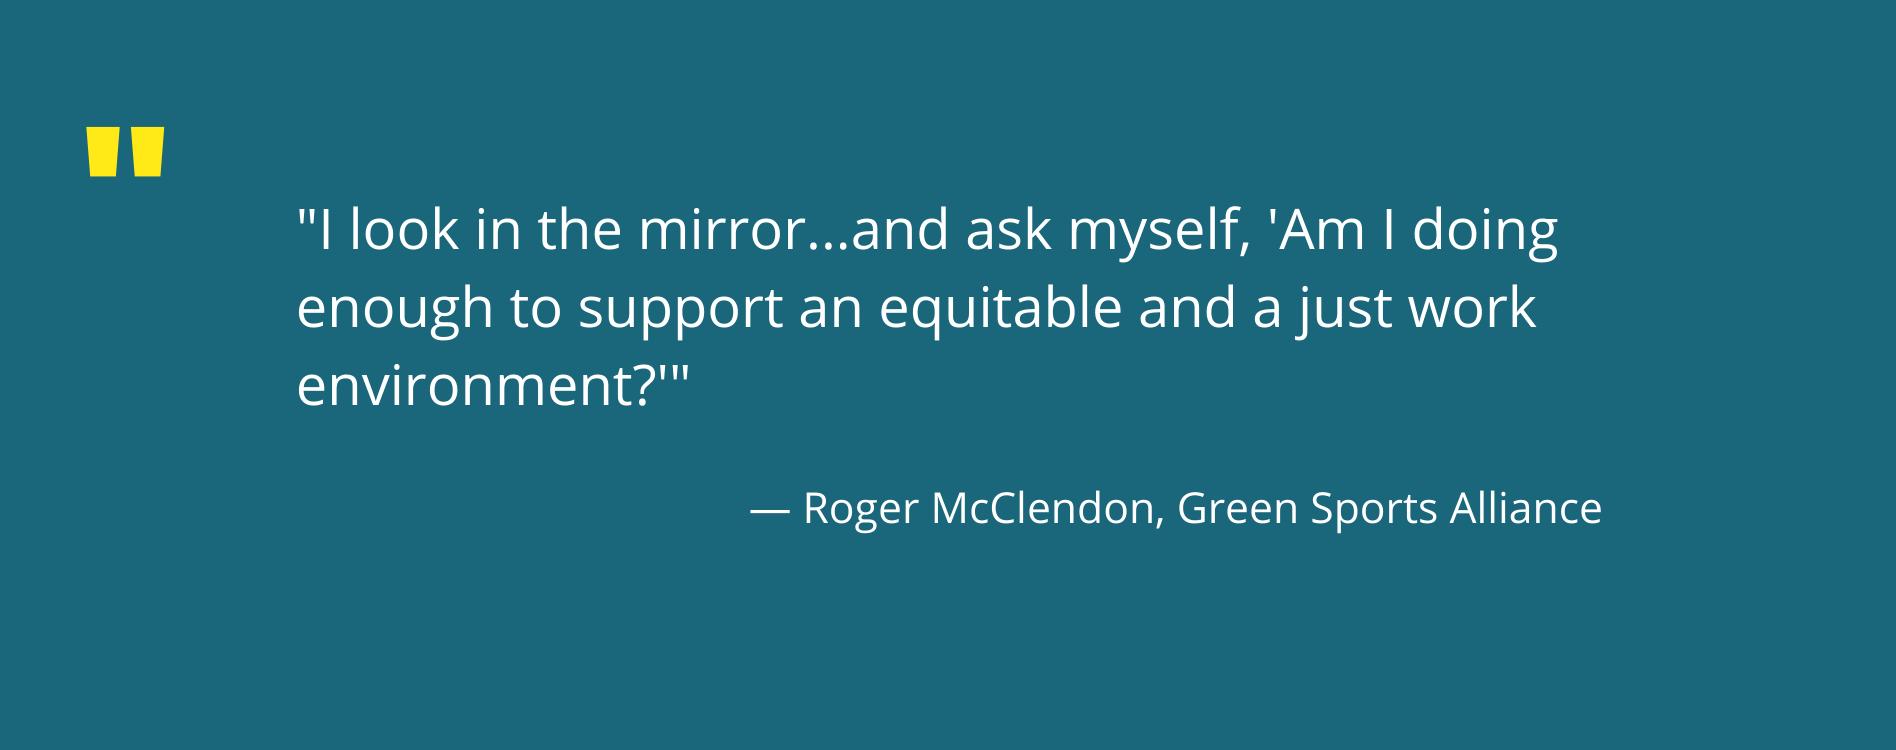 Roger McClendon quote